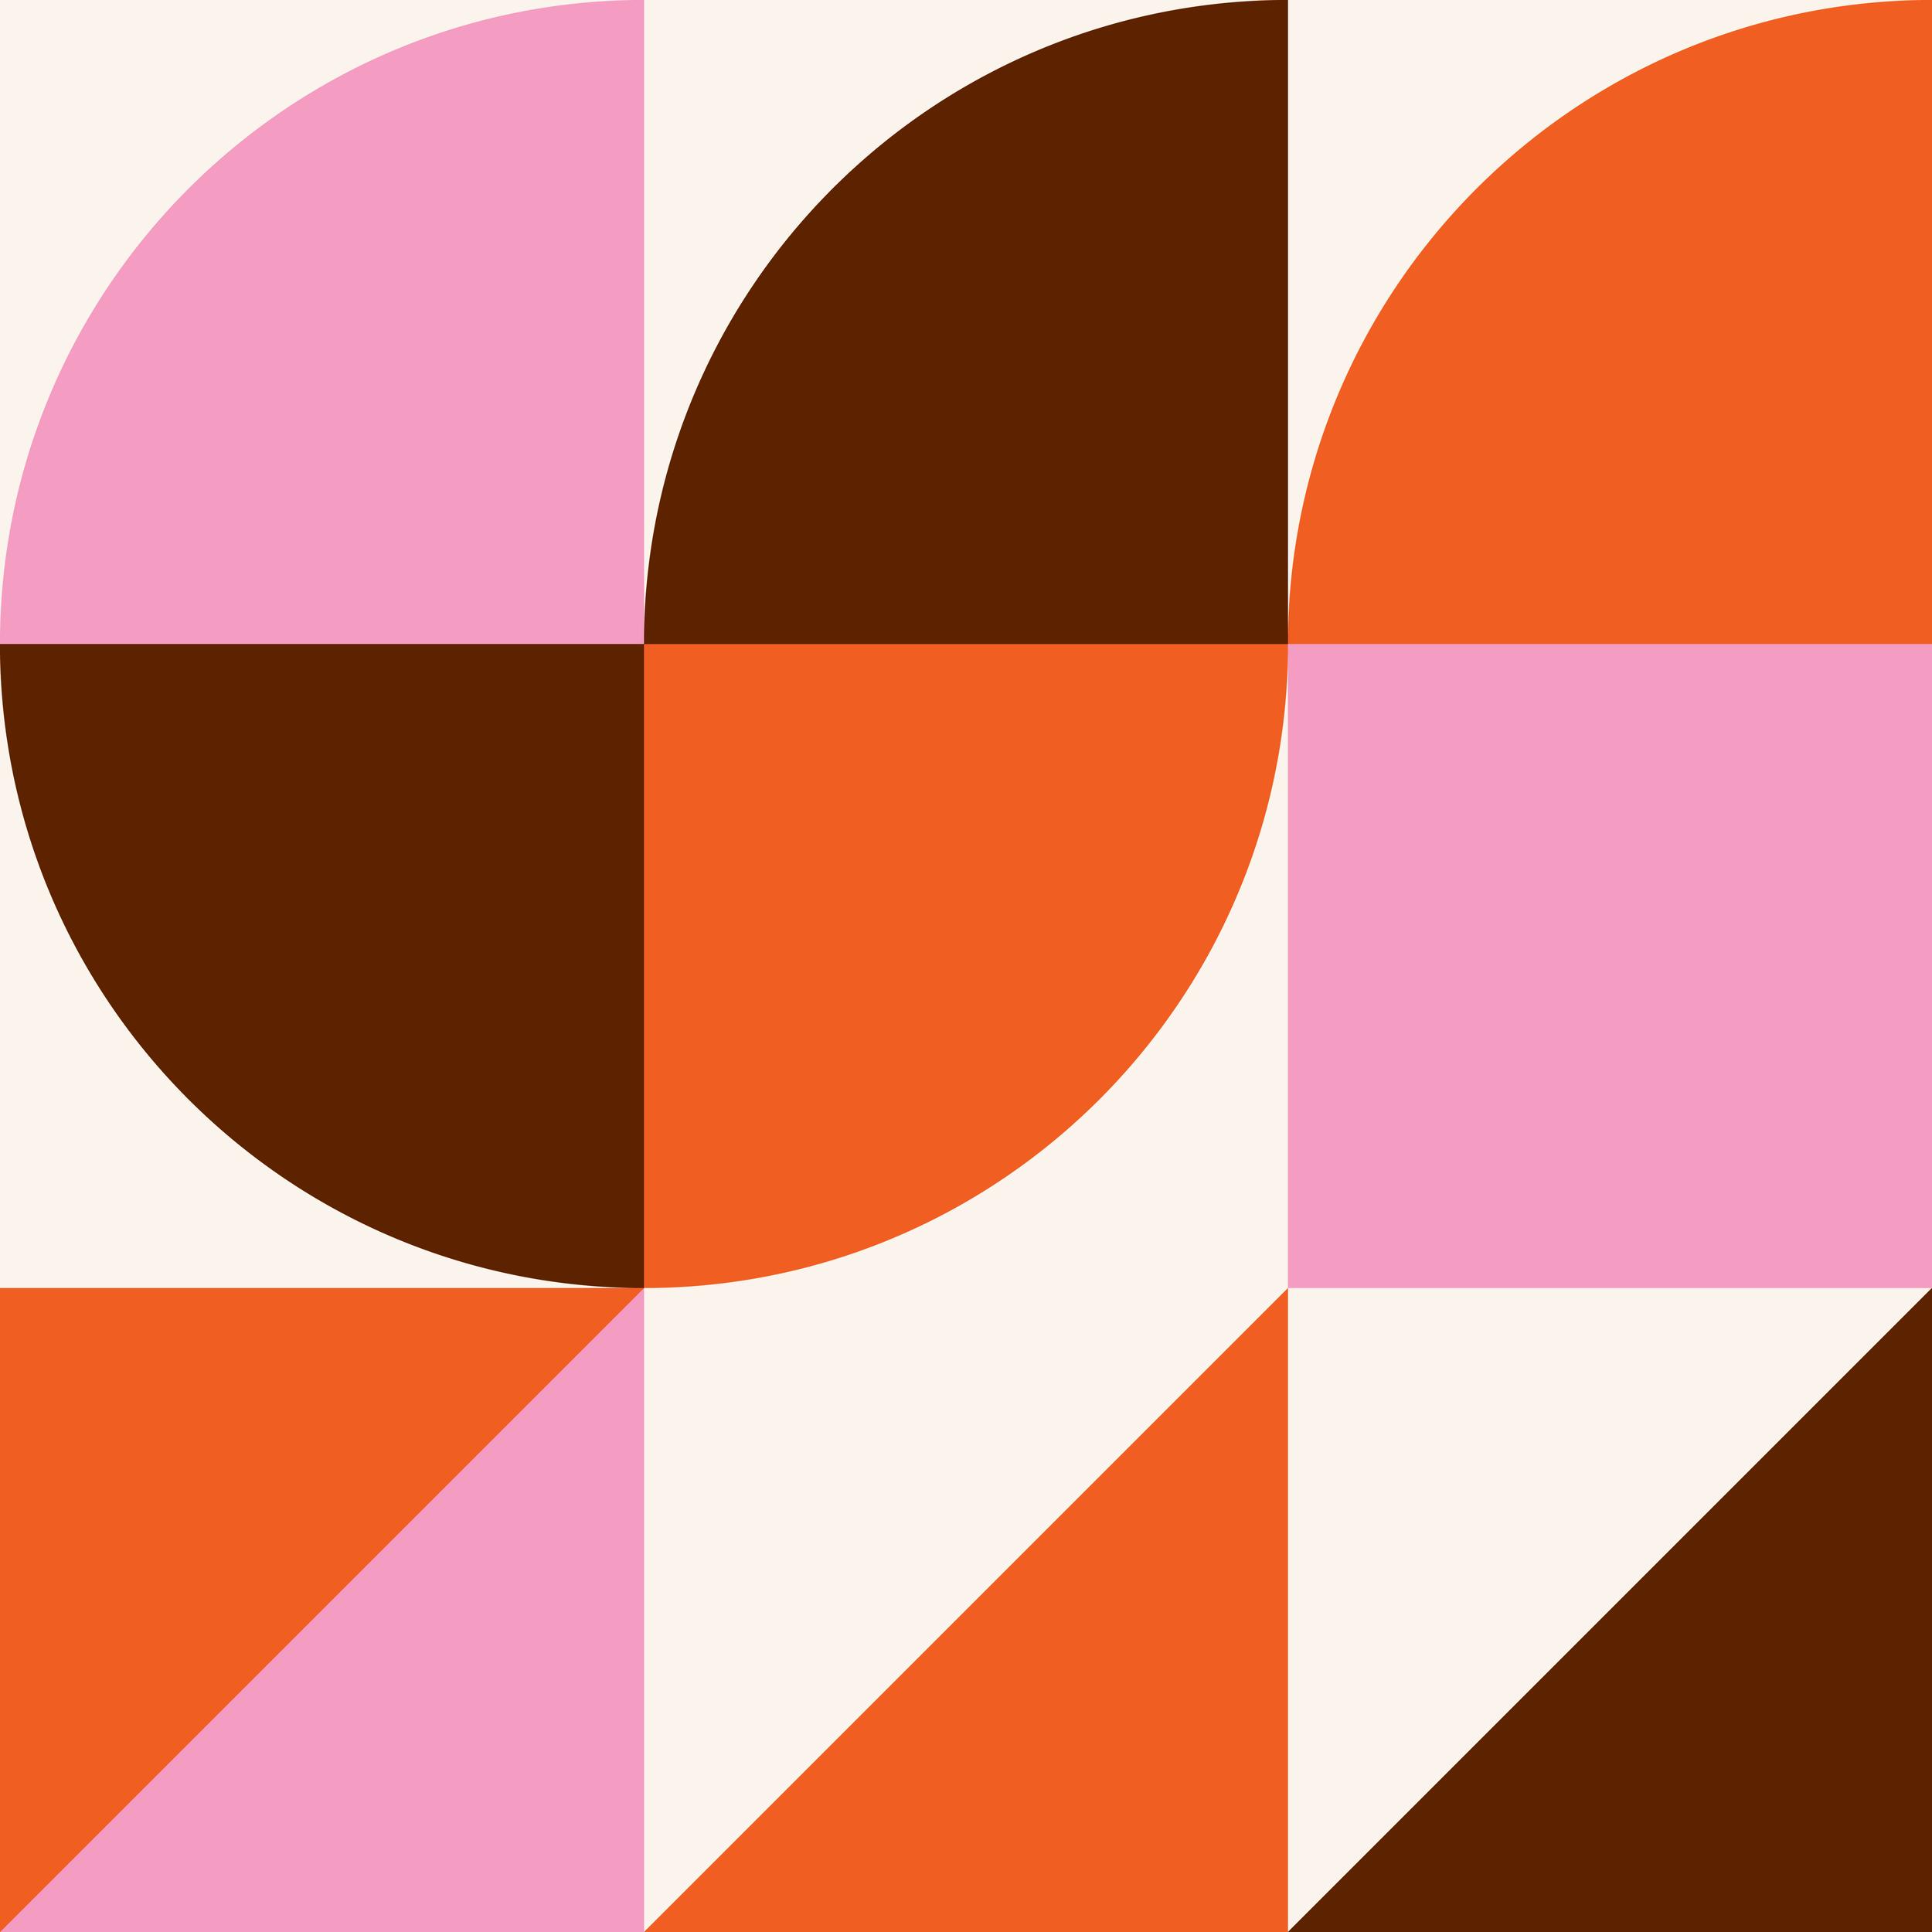 Shape-Color-Art-ShapePlay-05.png